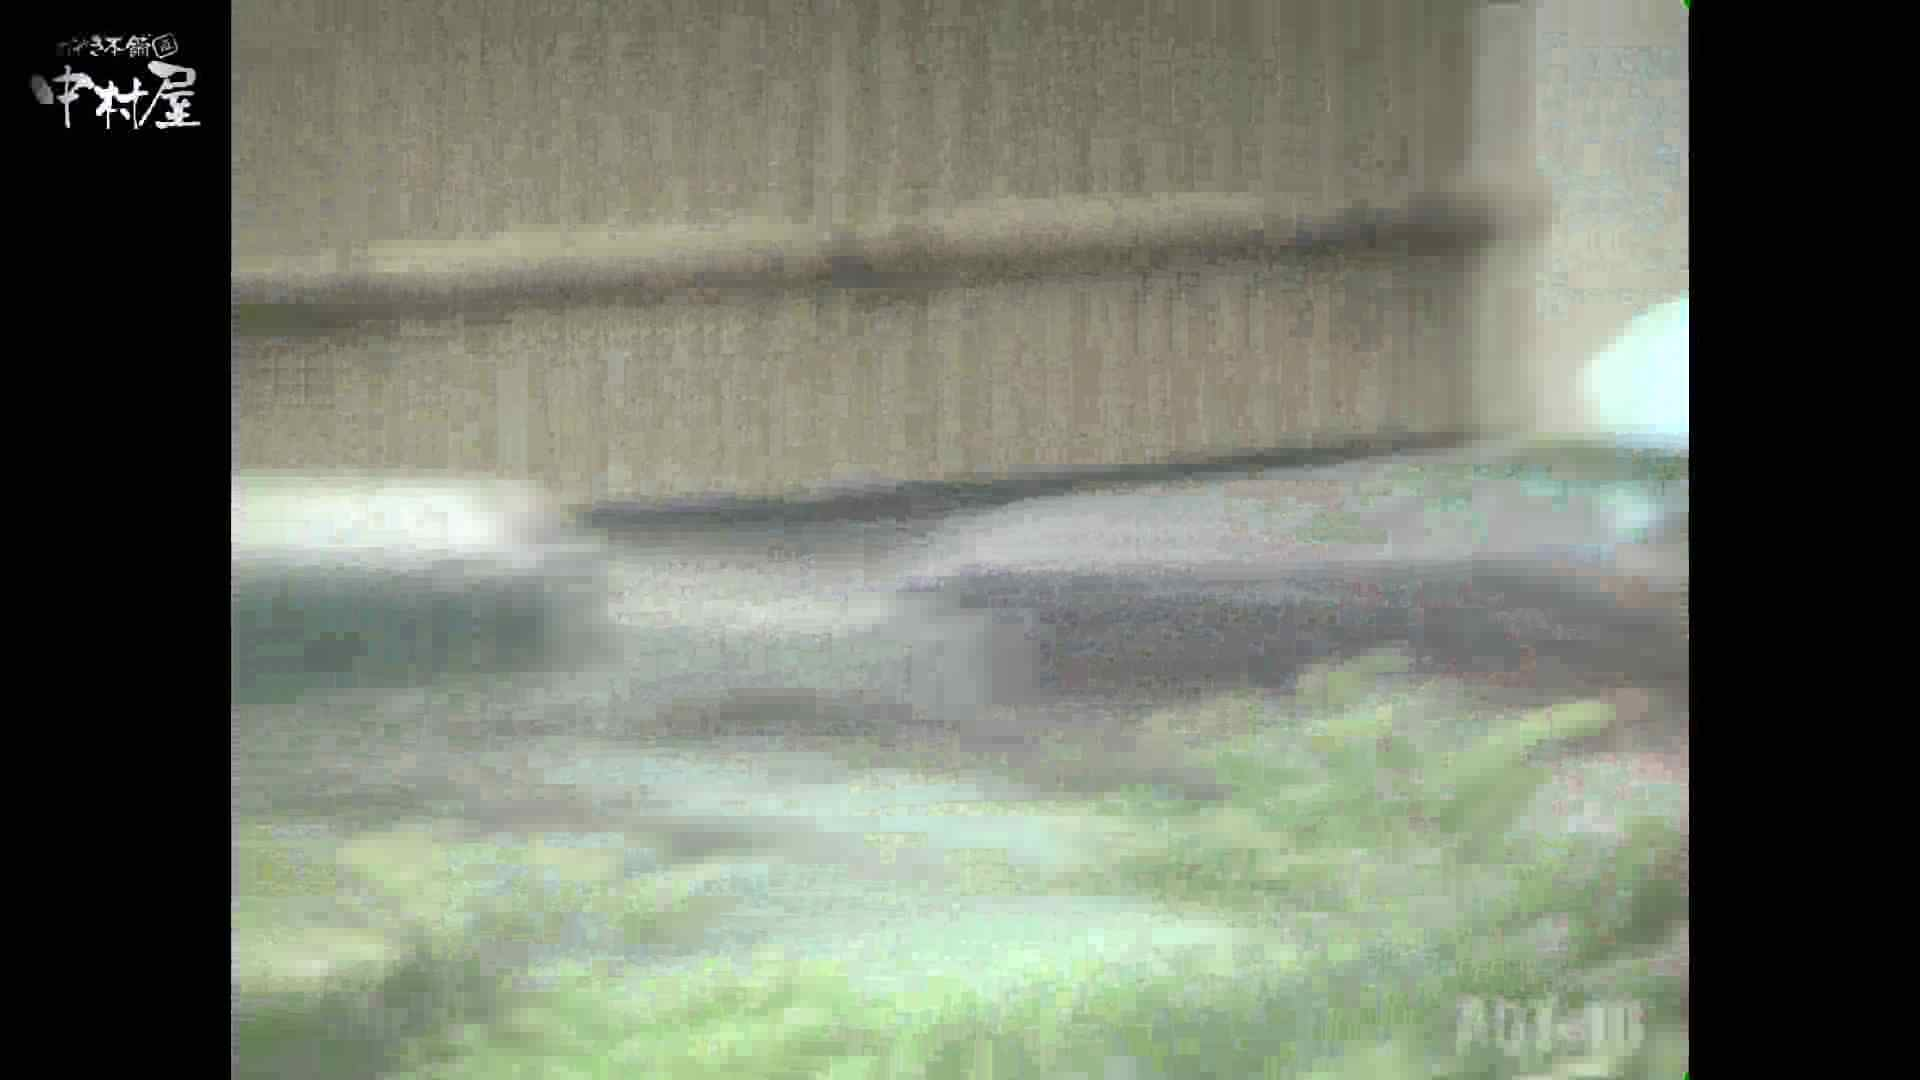 Aquaな露天風呂Vol.874潜入盗撮露天風呂十判湯 其の四 潜入   OLセックス  108画像 73